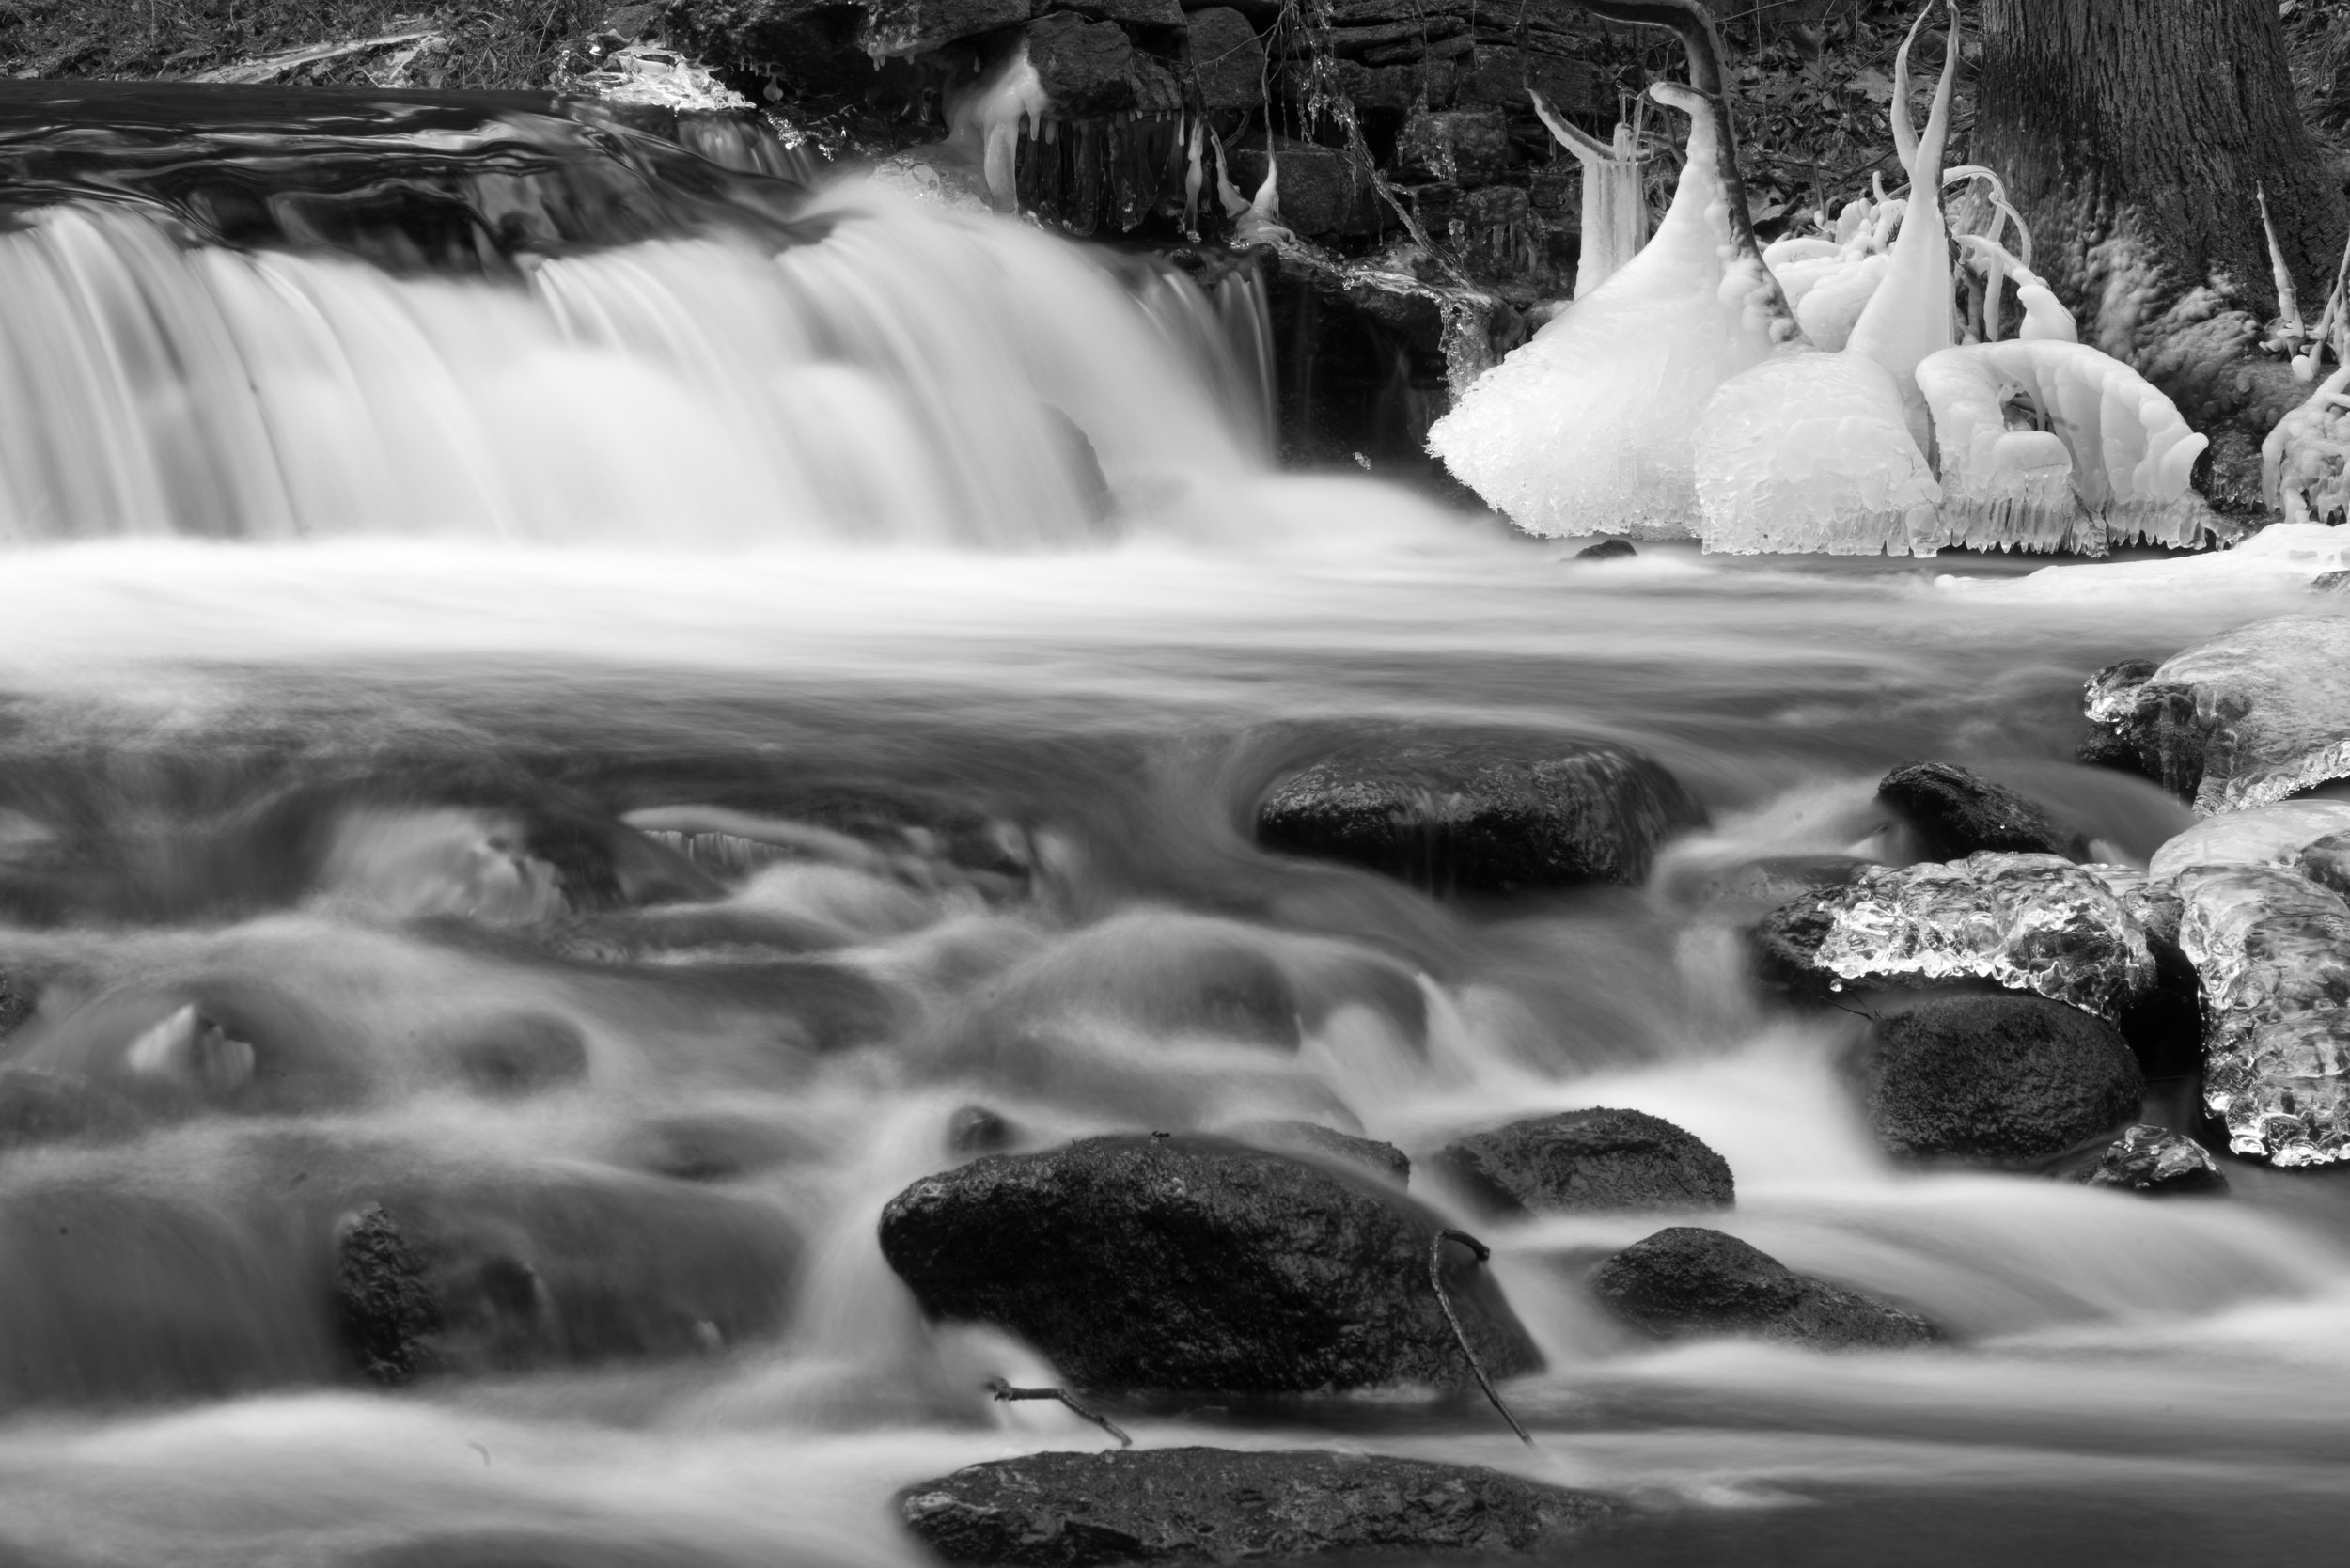 waterfall_with_ice.jpg